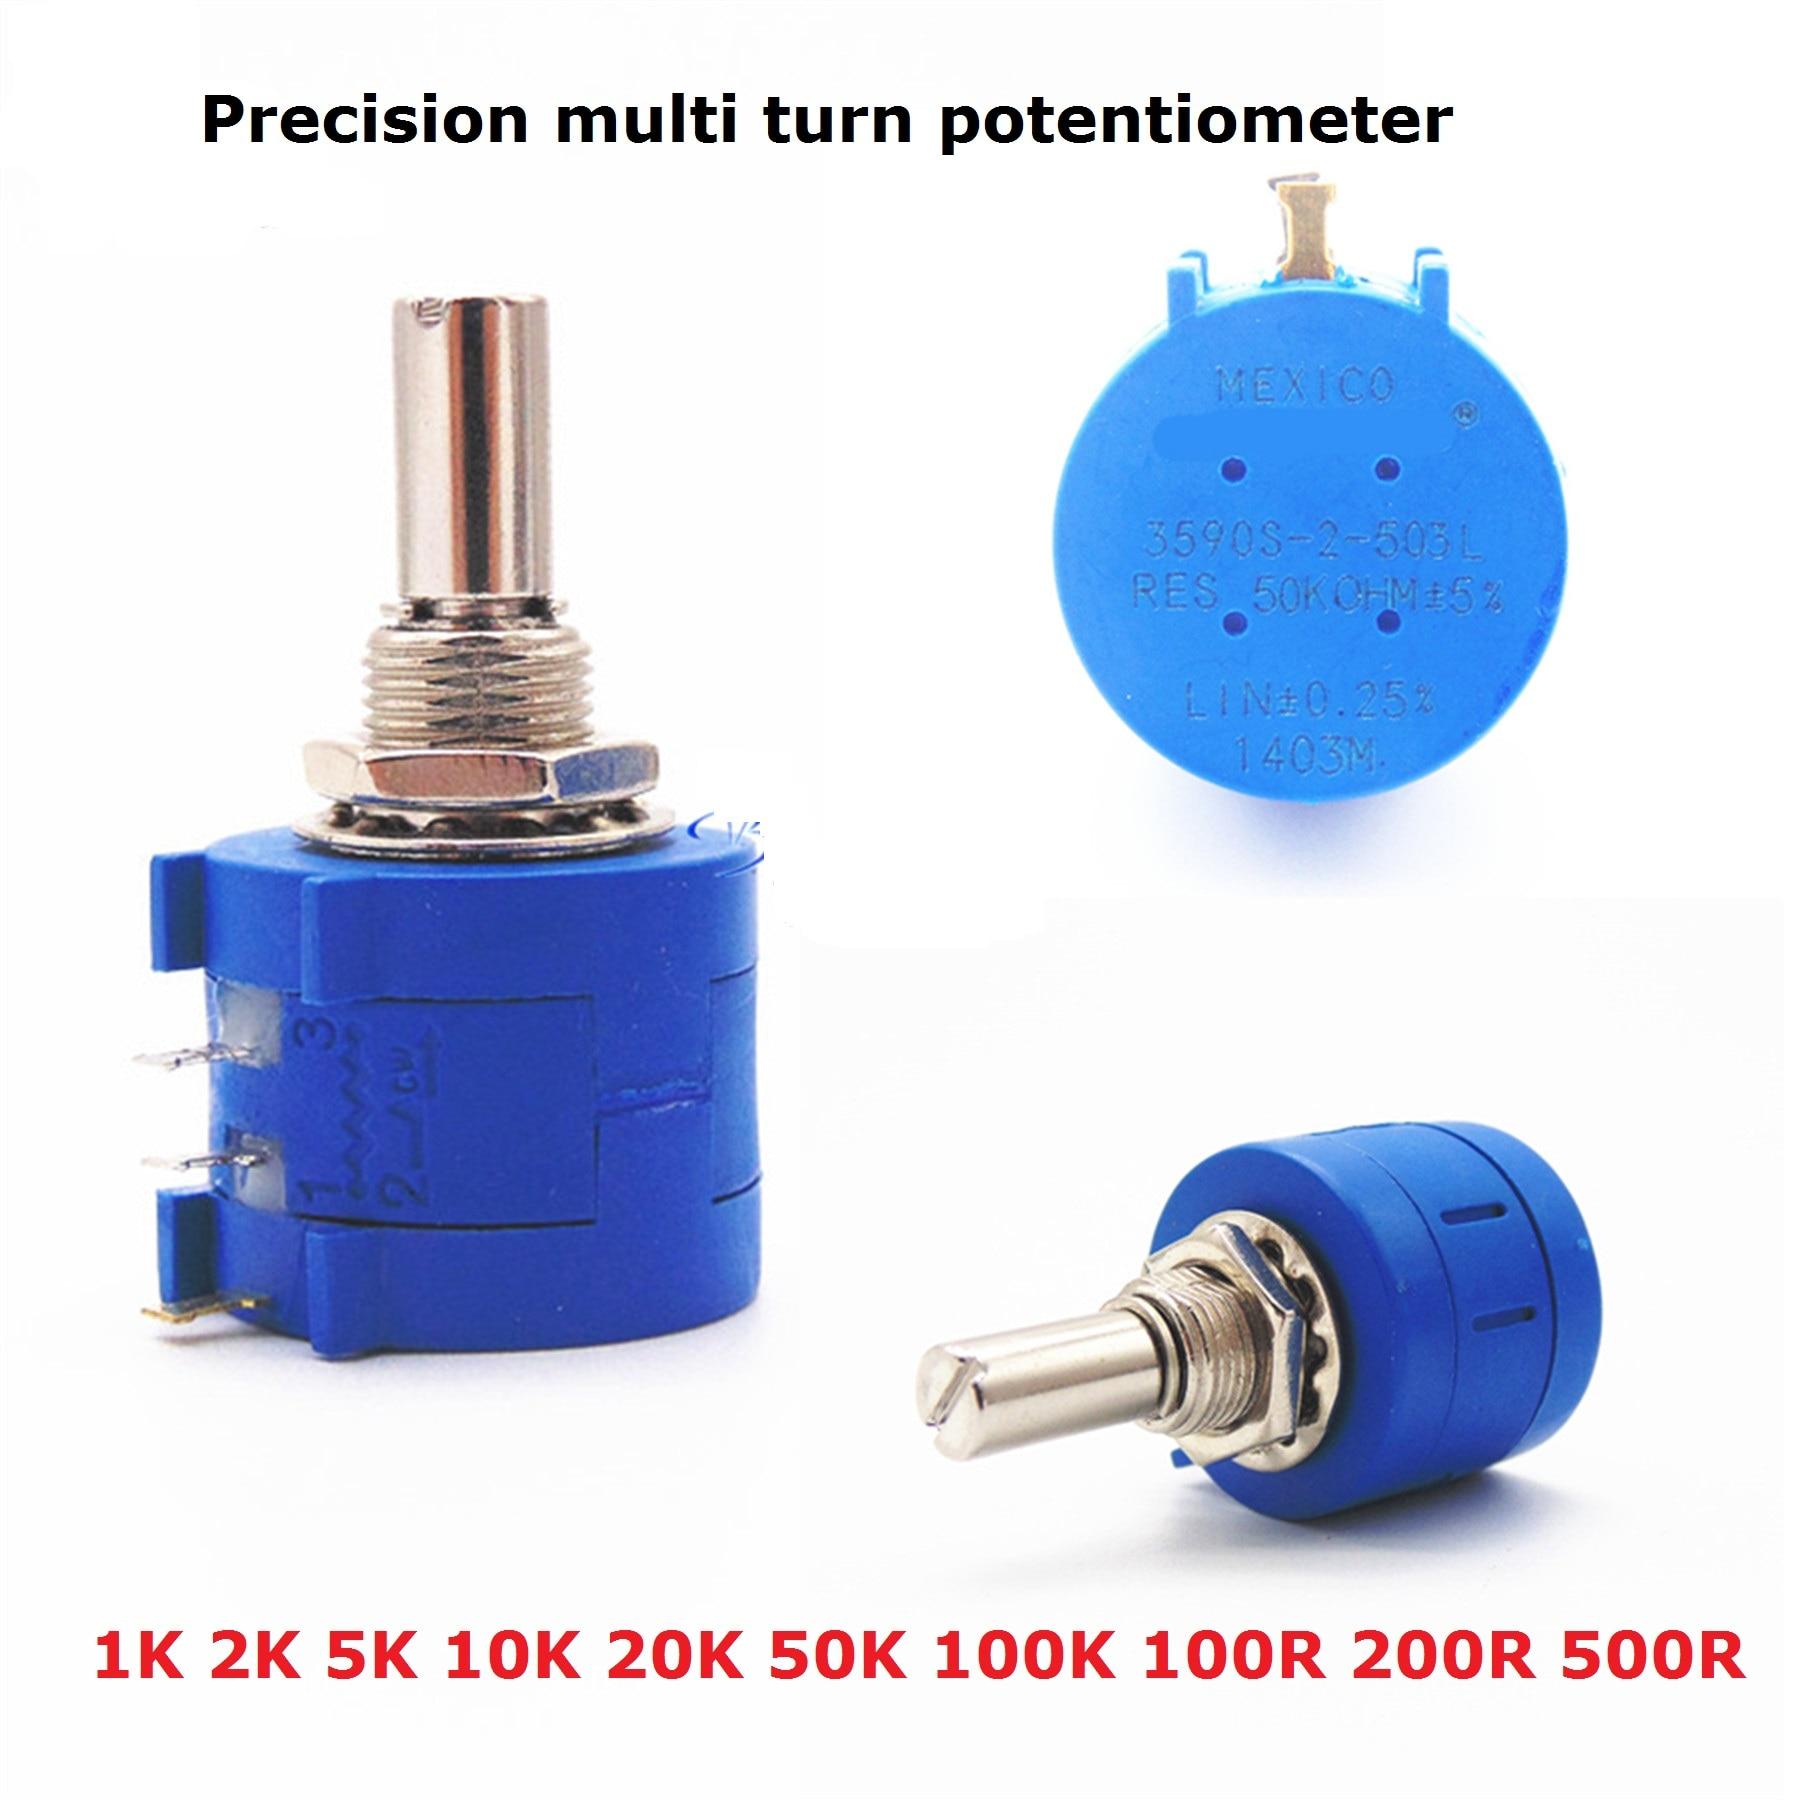 1PC de precisión de la potenciómetro 3590S-2-103 101, 503, 104, 201, 501, 102, 202, 502, 203 100R 200R 500R 1K 2K 5K 10K 20K 50K 100K